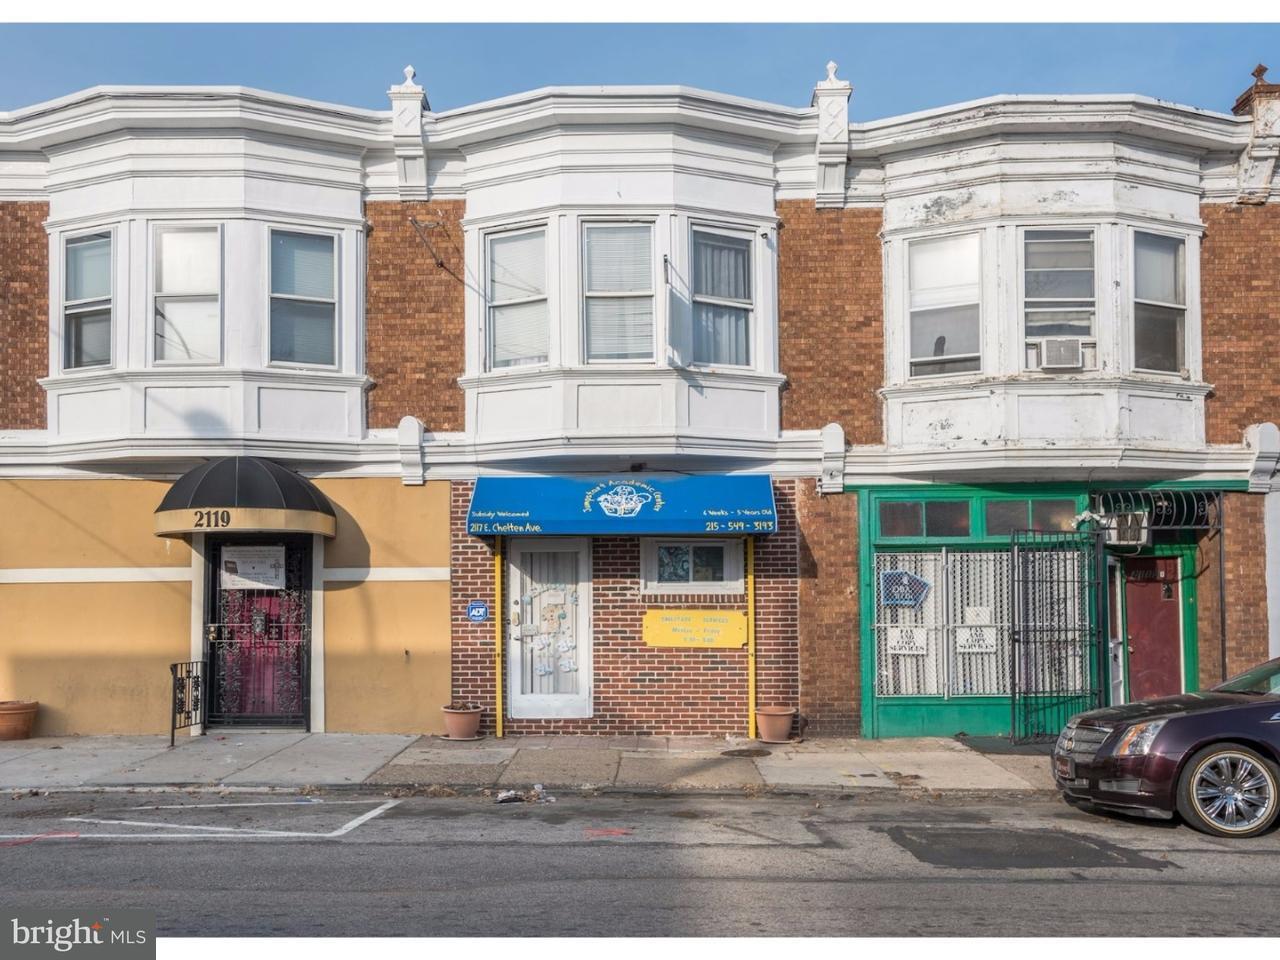 2117 E Chelten Philadelphia , PA 19138